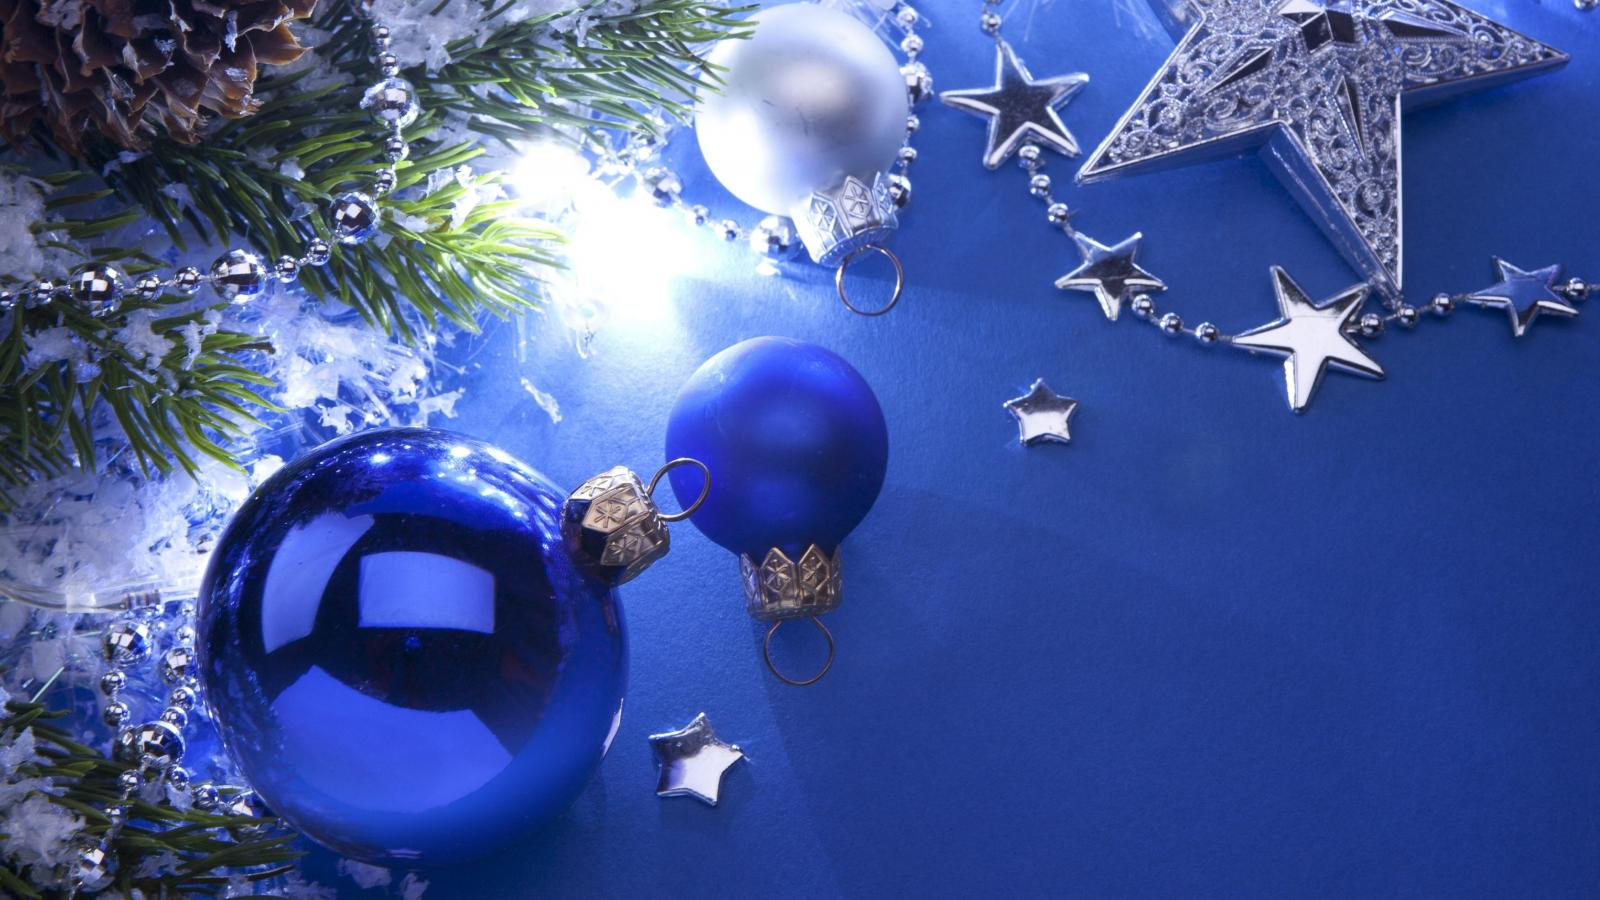 Christmas Wallpapers For Desktop Wallpaper 1600x900